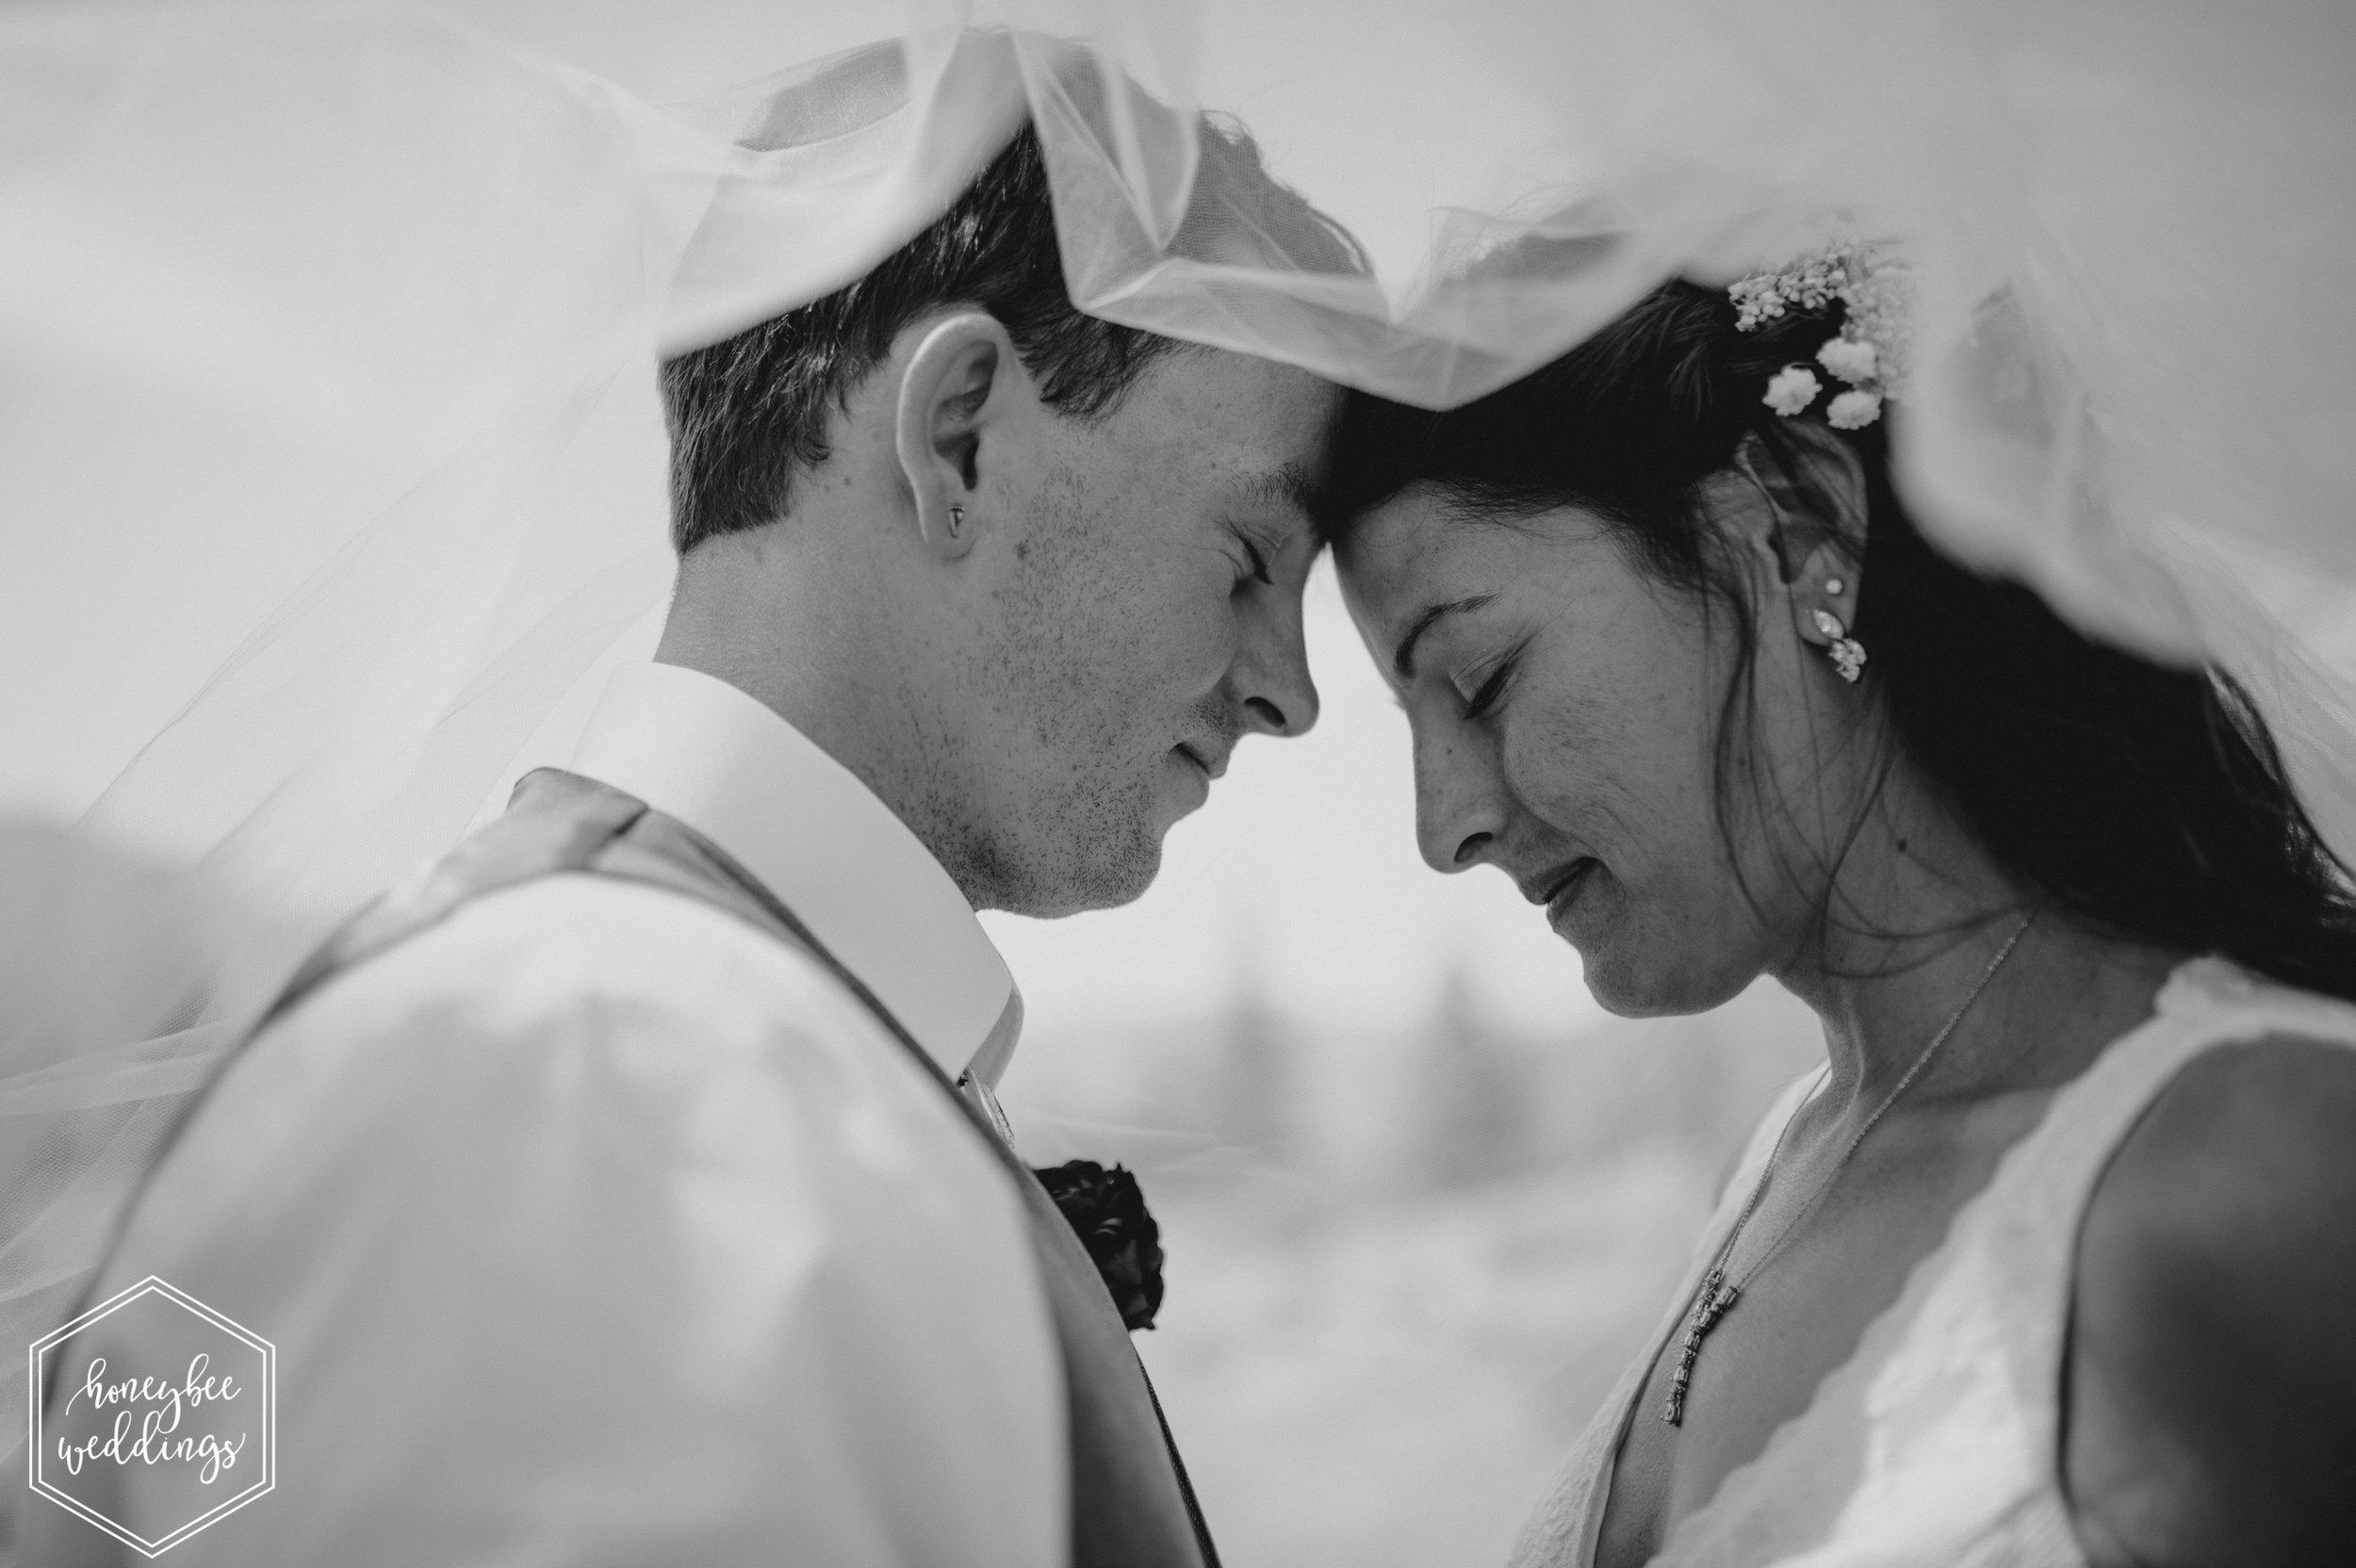 193 White Raven Wedding_Montana Wedding Photographer_Honeybee Weddings_ Meghan Maloney + Arza Hammond 2018-0126-2.jpg